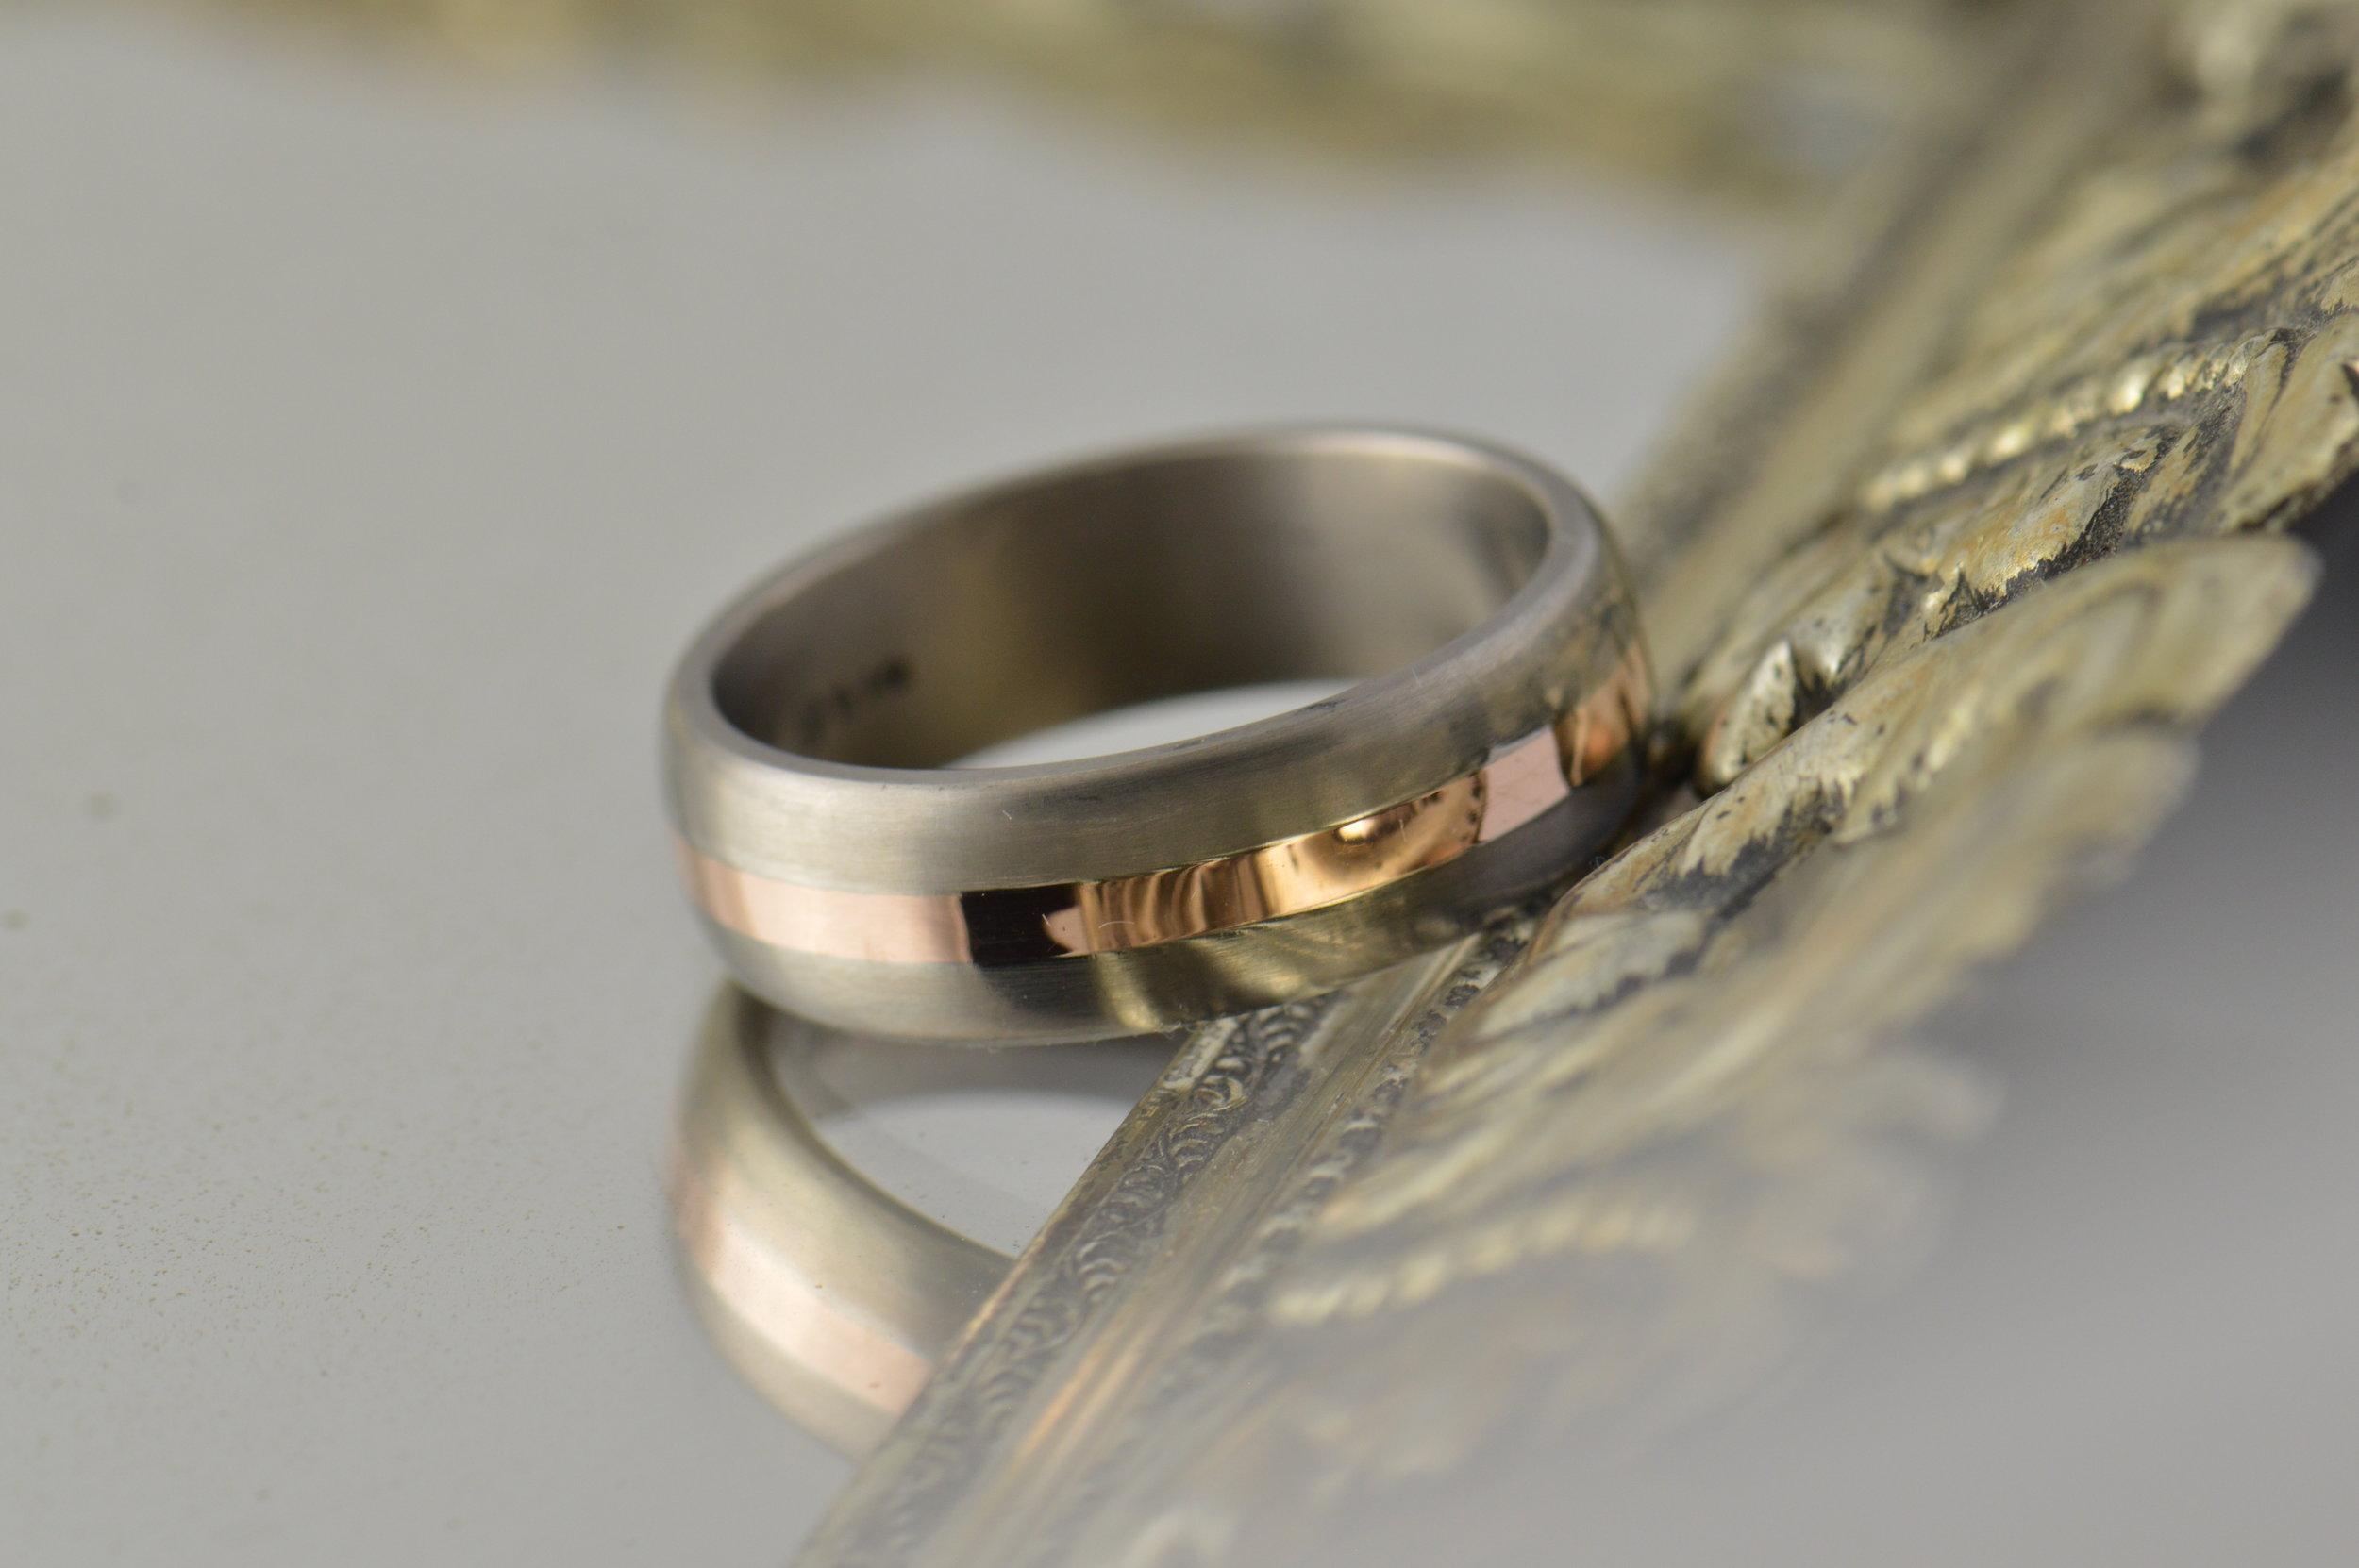 darvier-rose-gold-inlay-titanium-ring.JPG